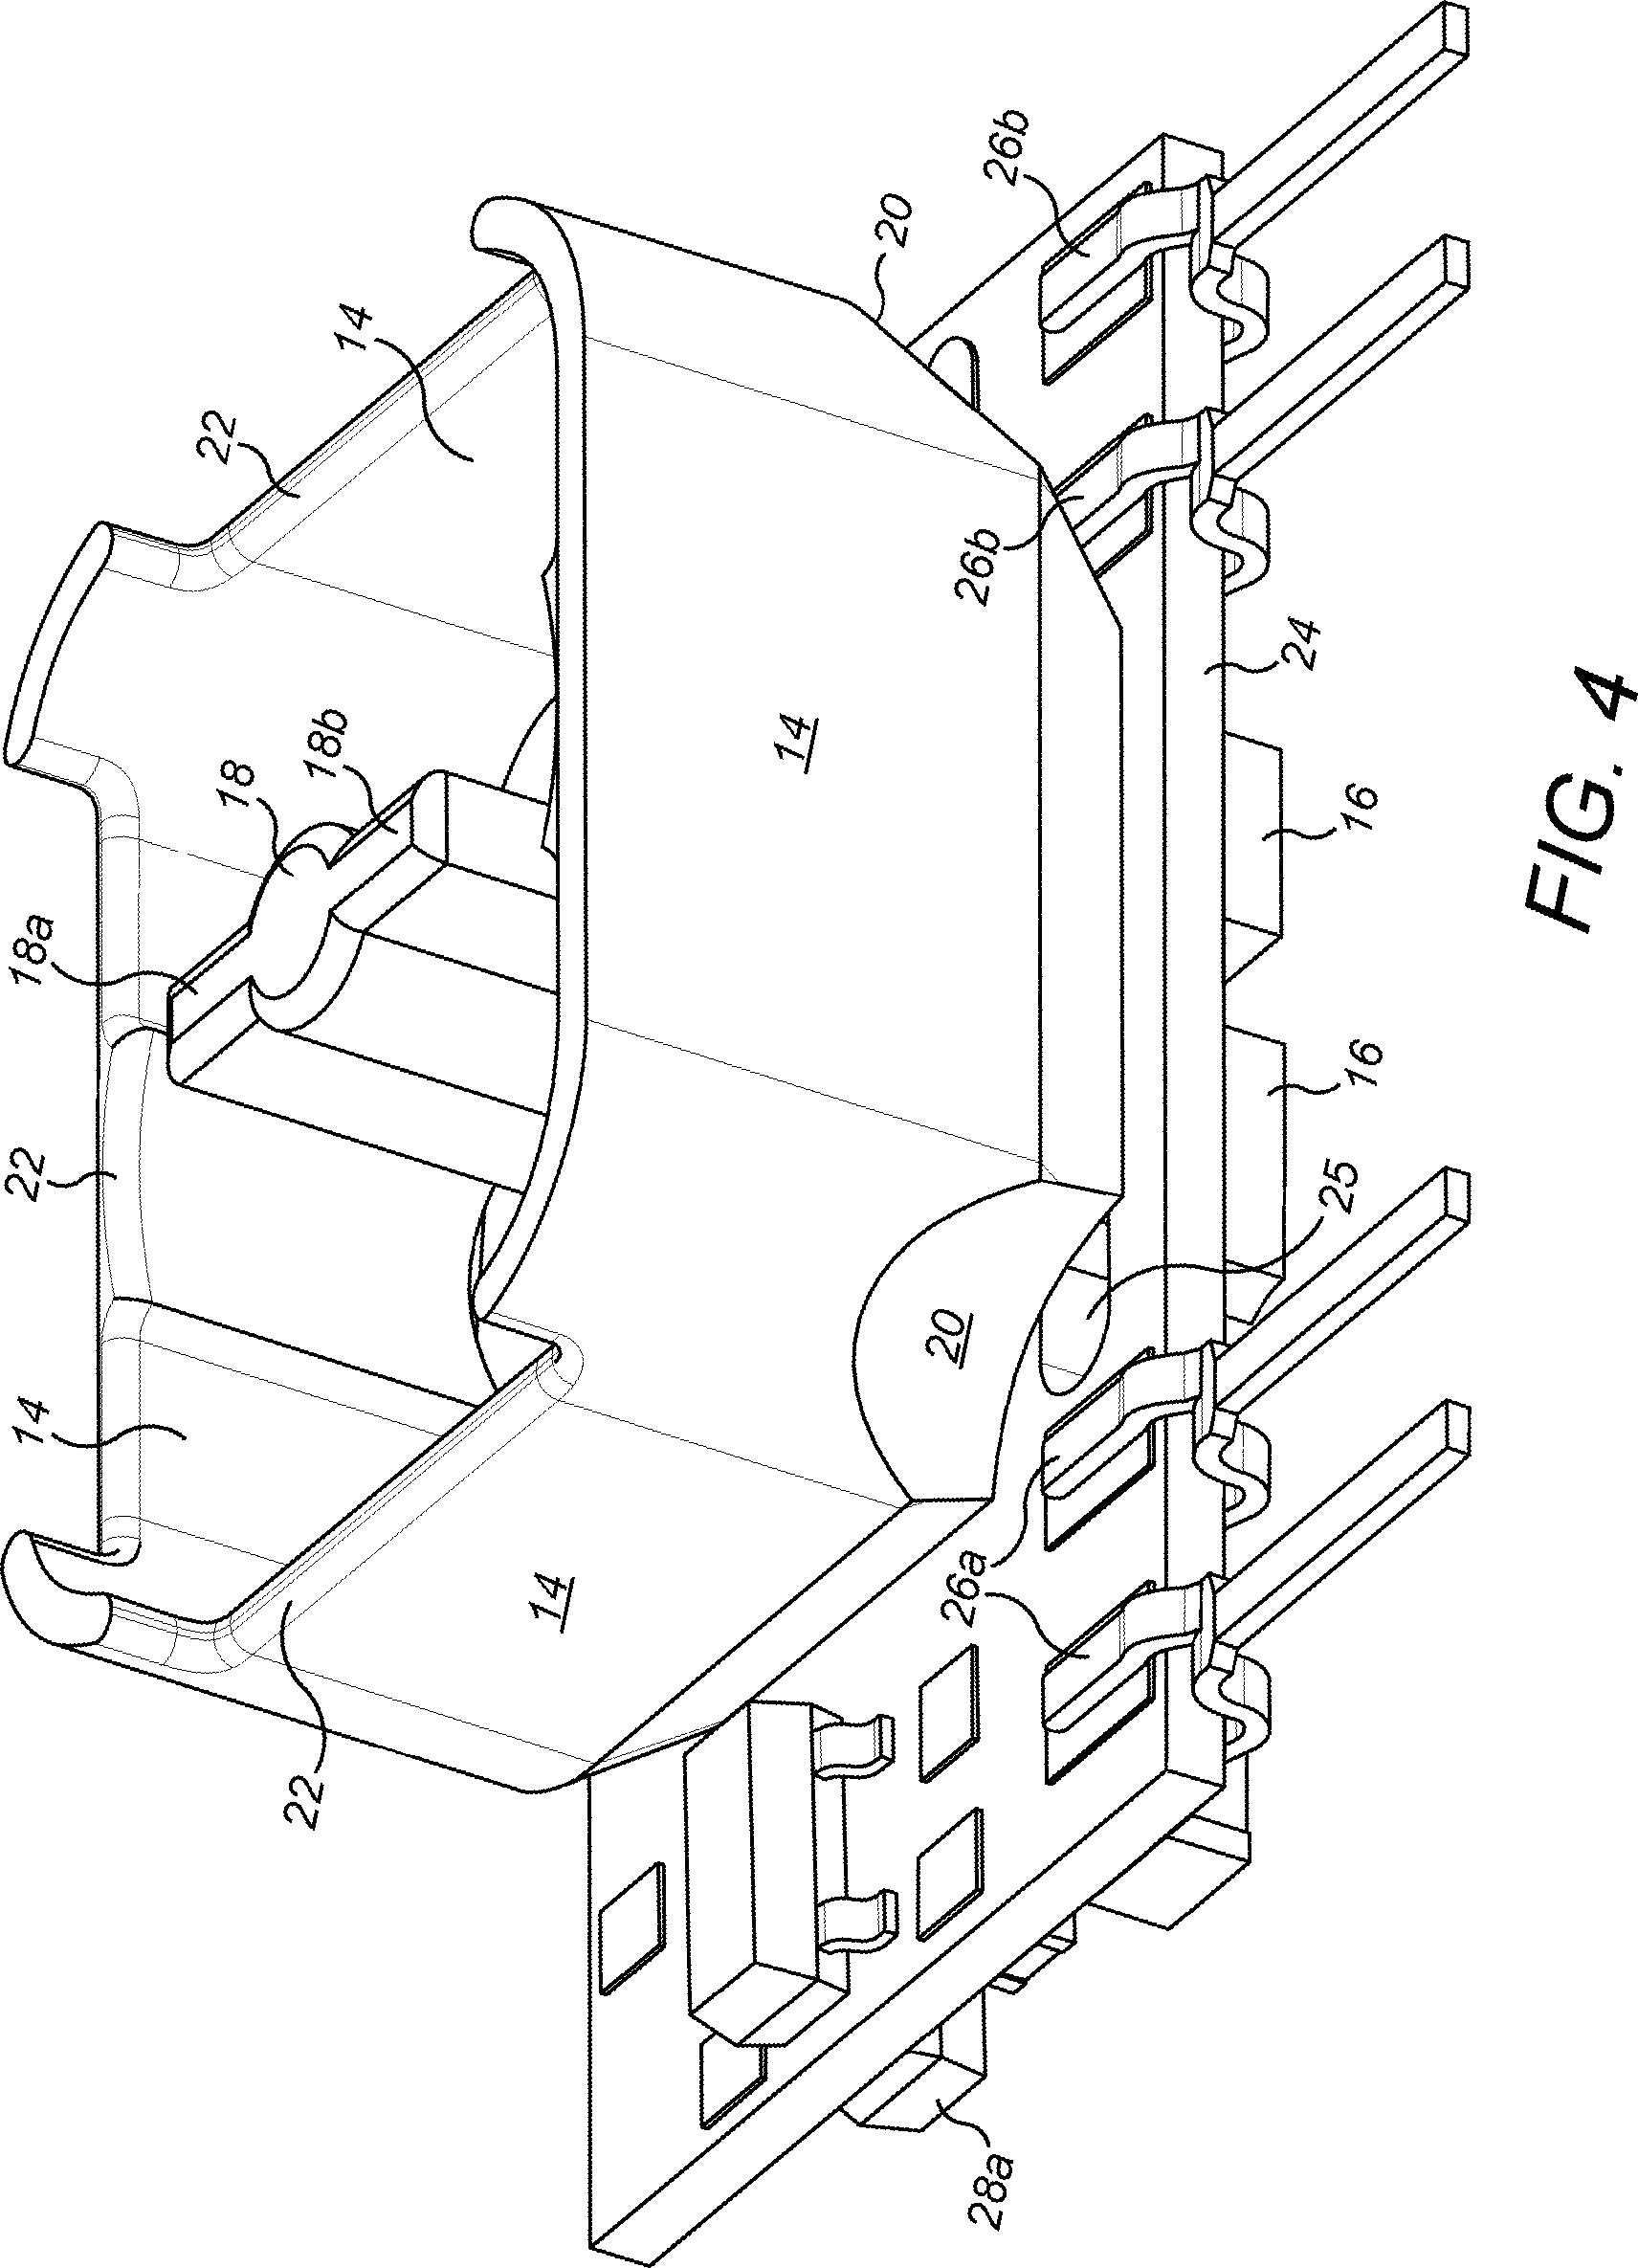 Figure GB2555832A_D0005